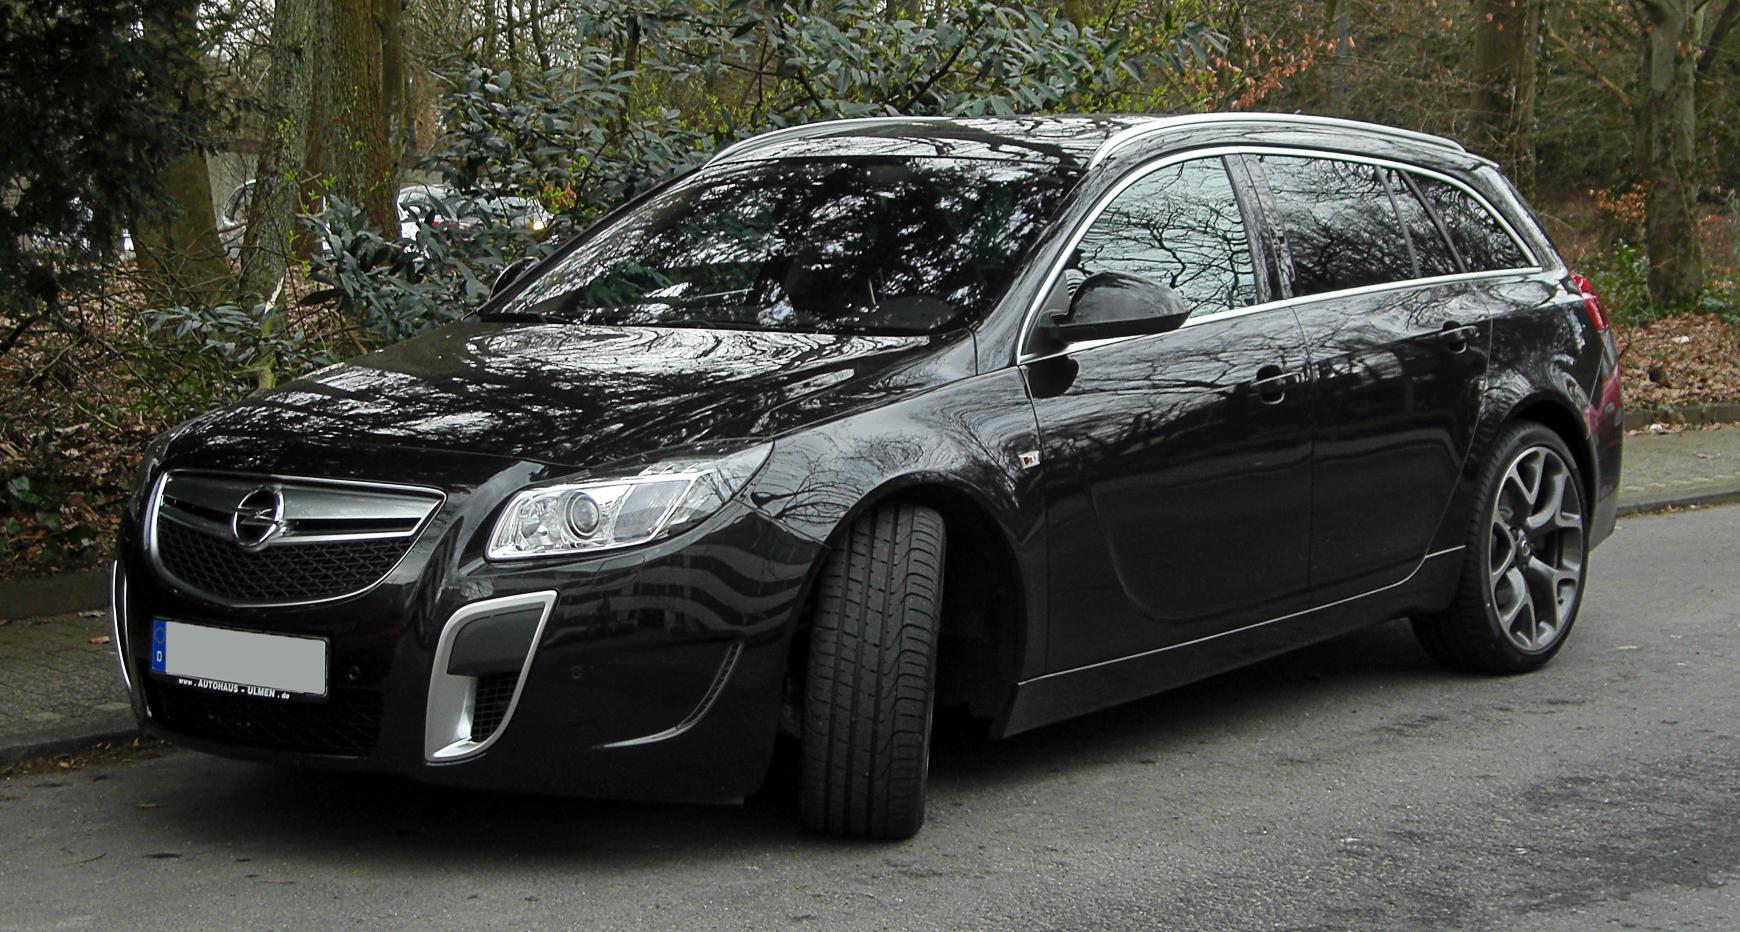 File:Opel Insignia Sports Tourer OPC – Frontansicht, 13. März 2011 ...